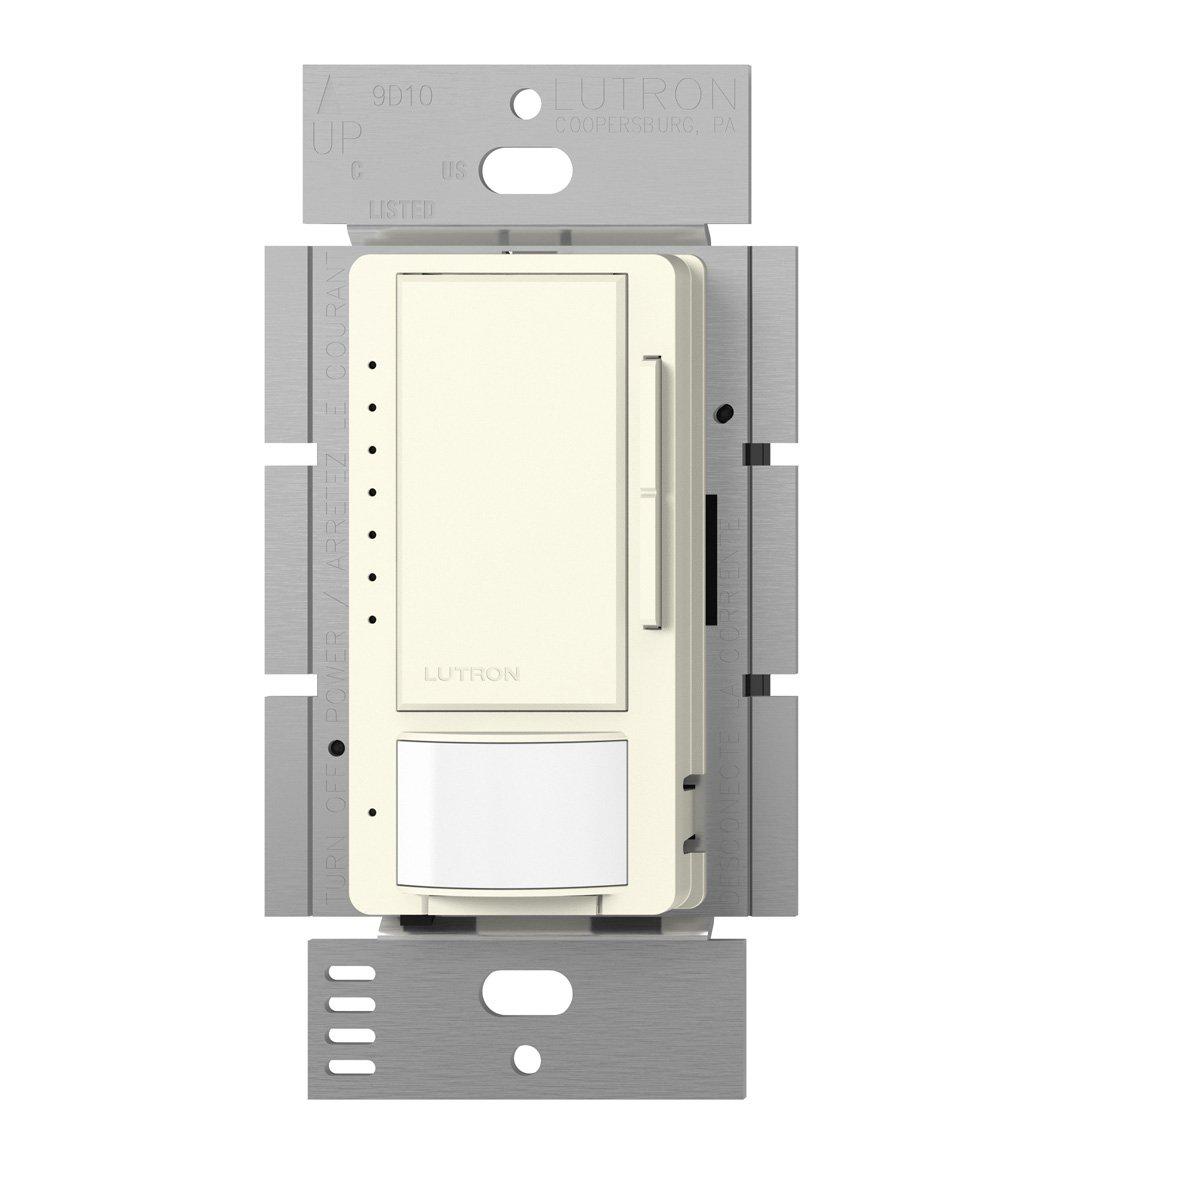 Lutron Maestro CL単極/ multi-location Vacancy Sensingディマー MSCL-VP153M-BI 1 B00FQL1S22 ビスケット ビスケット